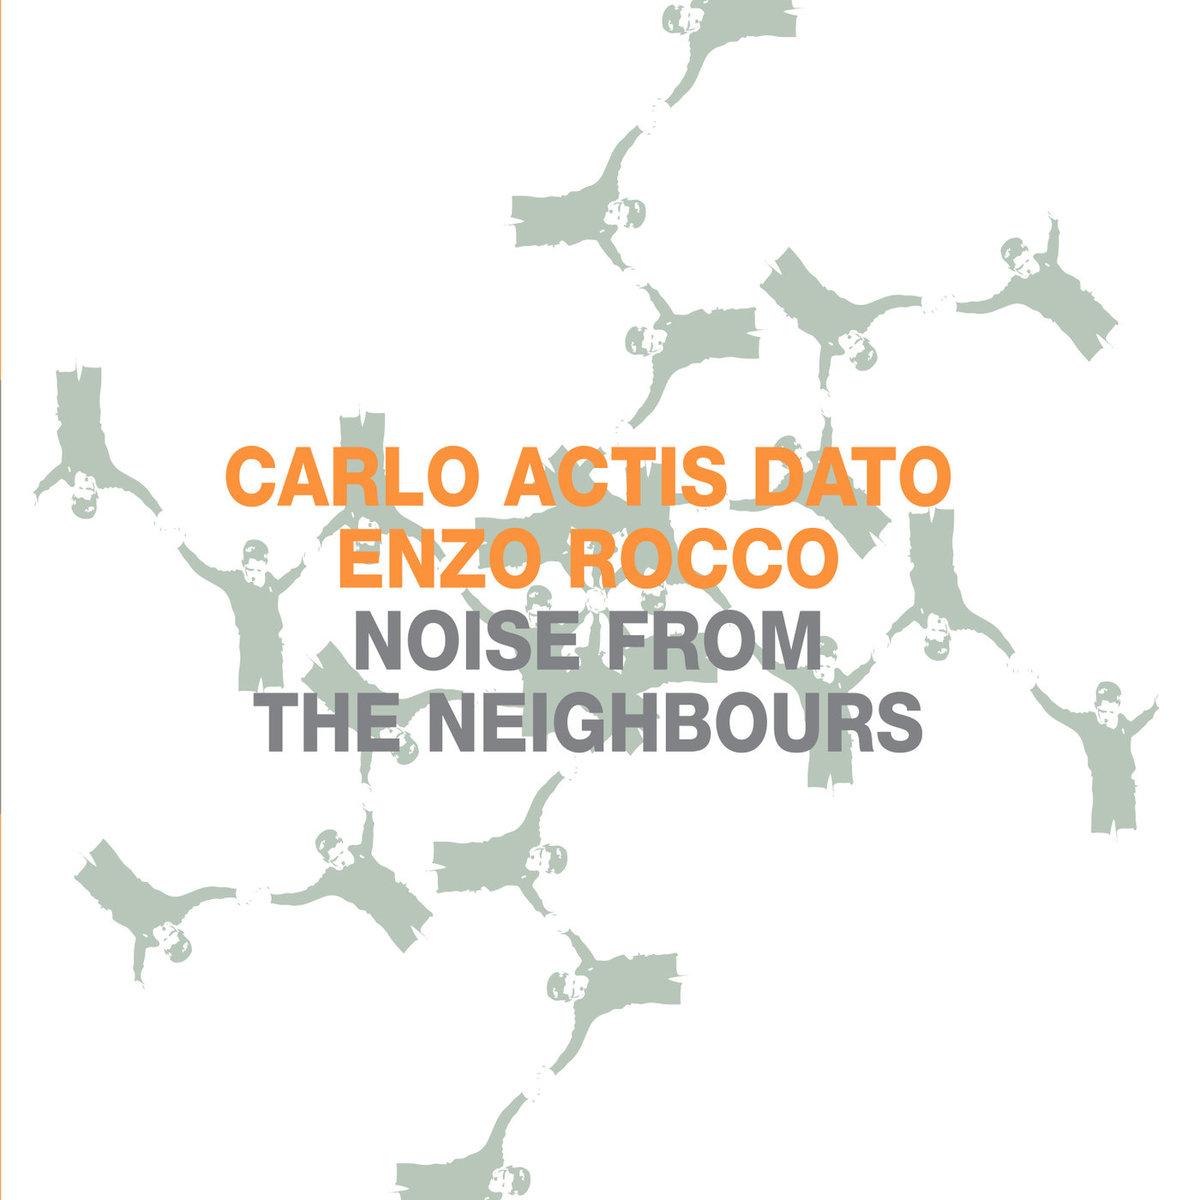 Carlo Actis Dato, Enzo Rocco</br>Noise Fron The Neighbours</br>Setola di maiale, 2016